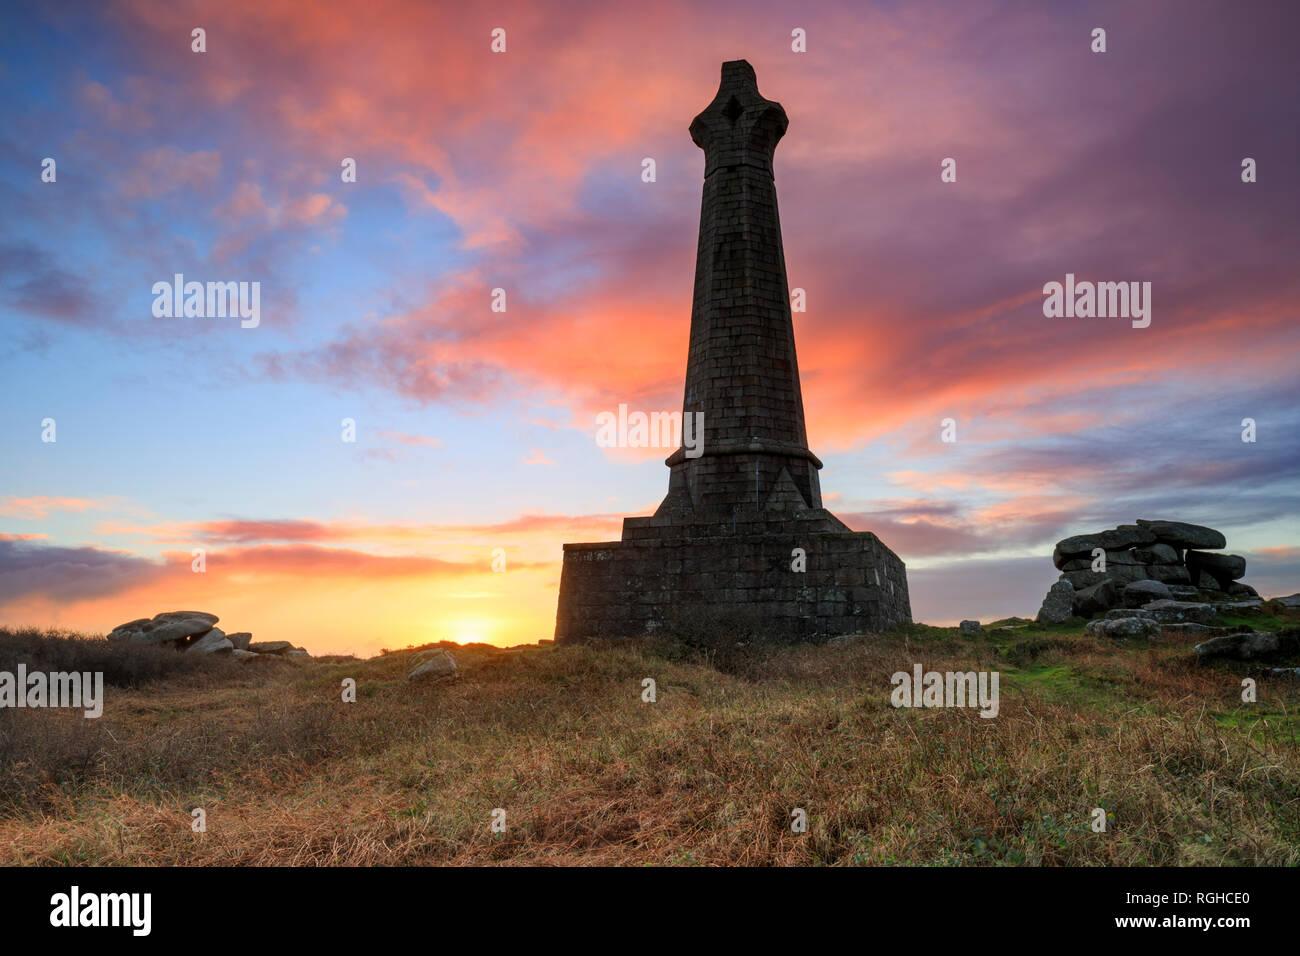 The Bassett Monument on Carn Brea captured at sunrise. - Stock Image